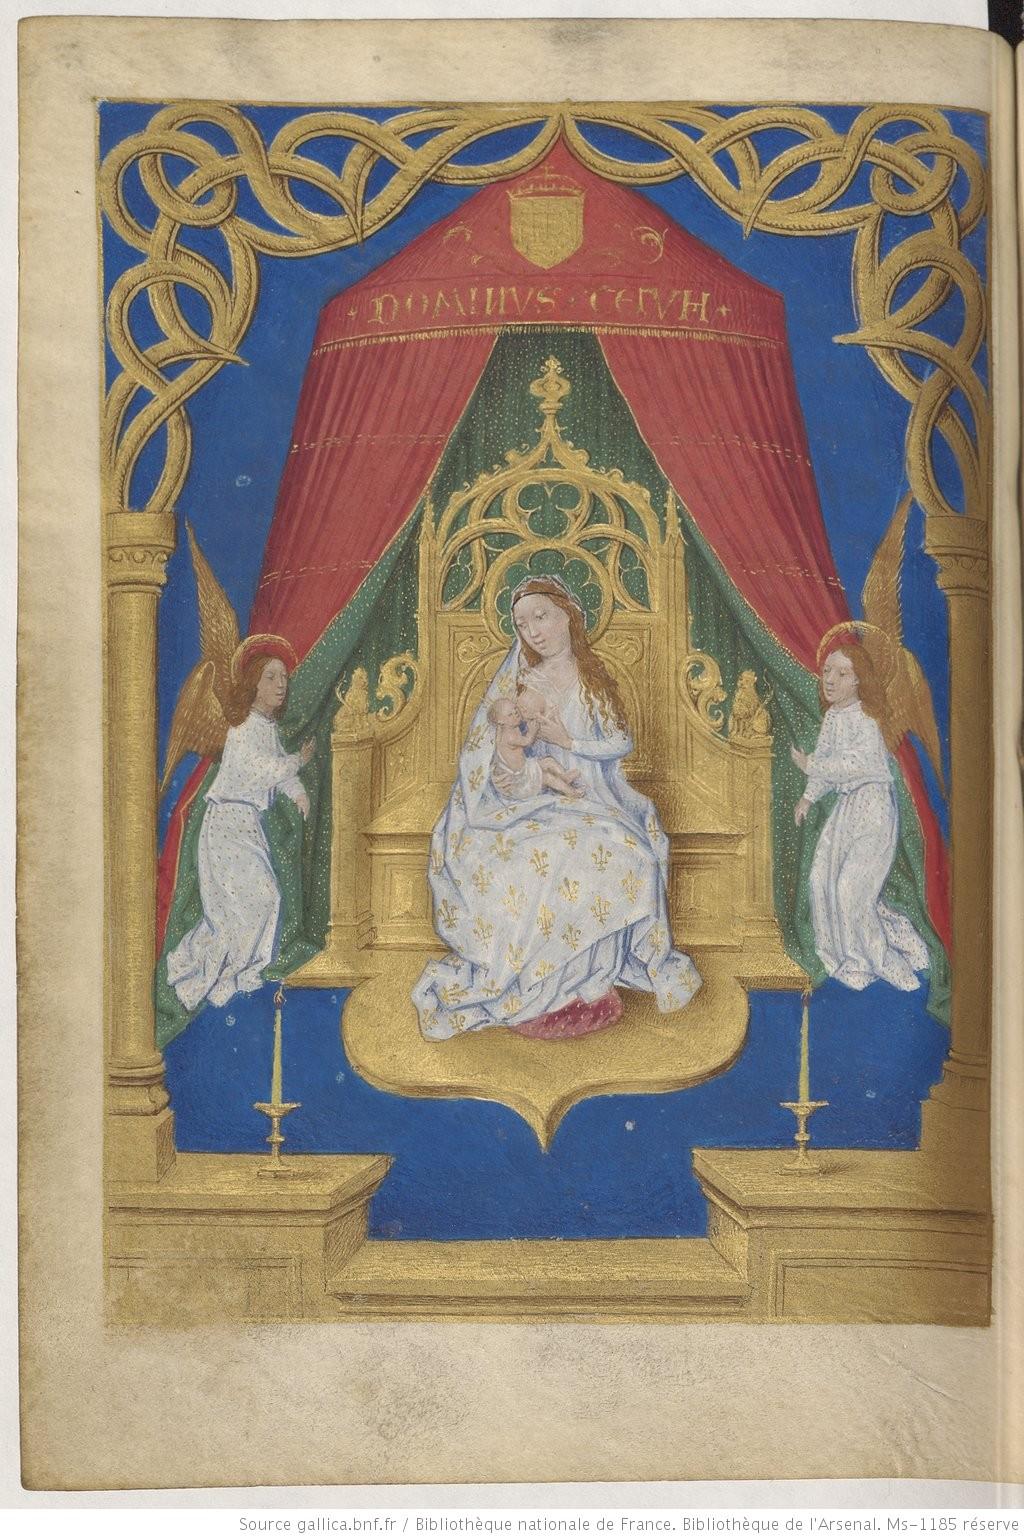 1490-96 Heures de Boussu, BNF Arsenal. Ms-1185 reserve fol 53v Gallica